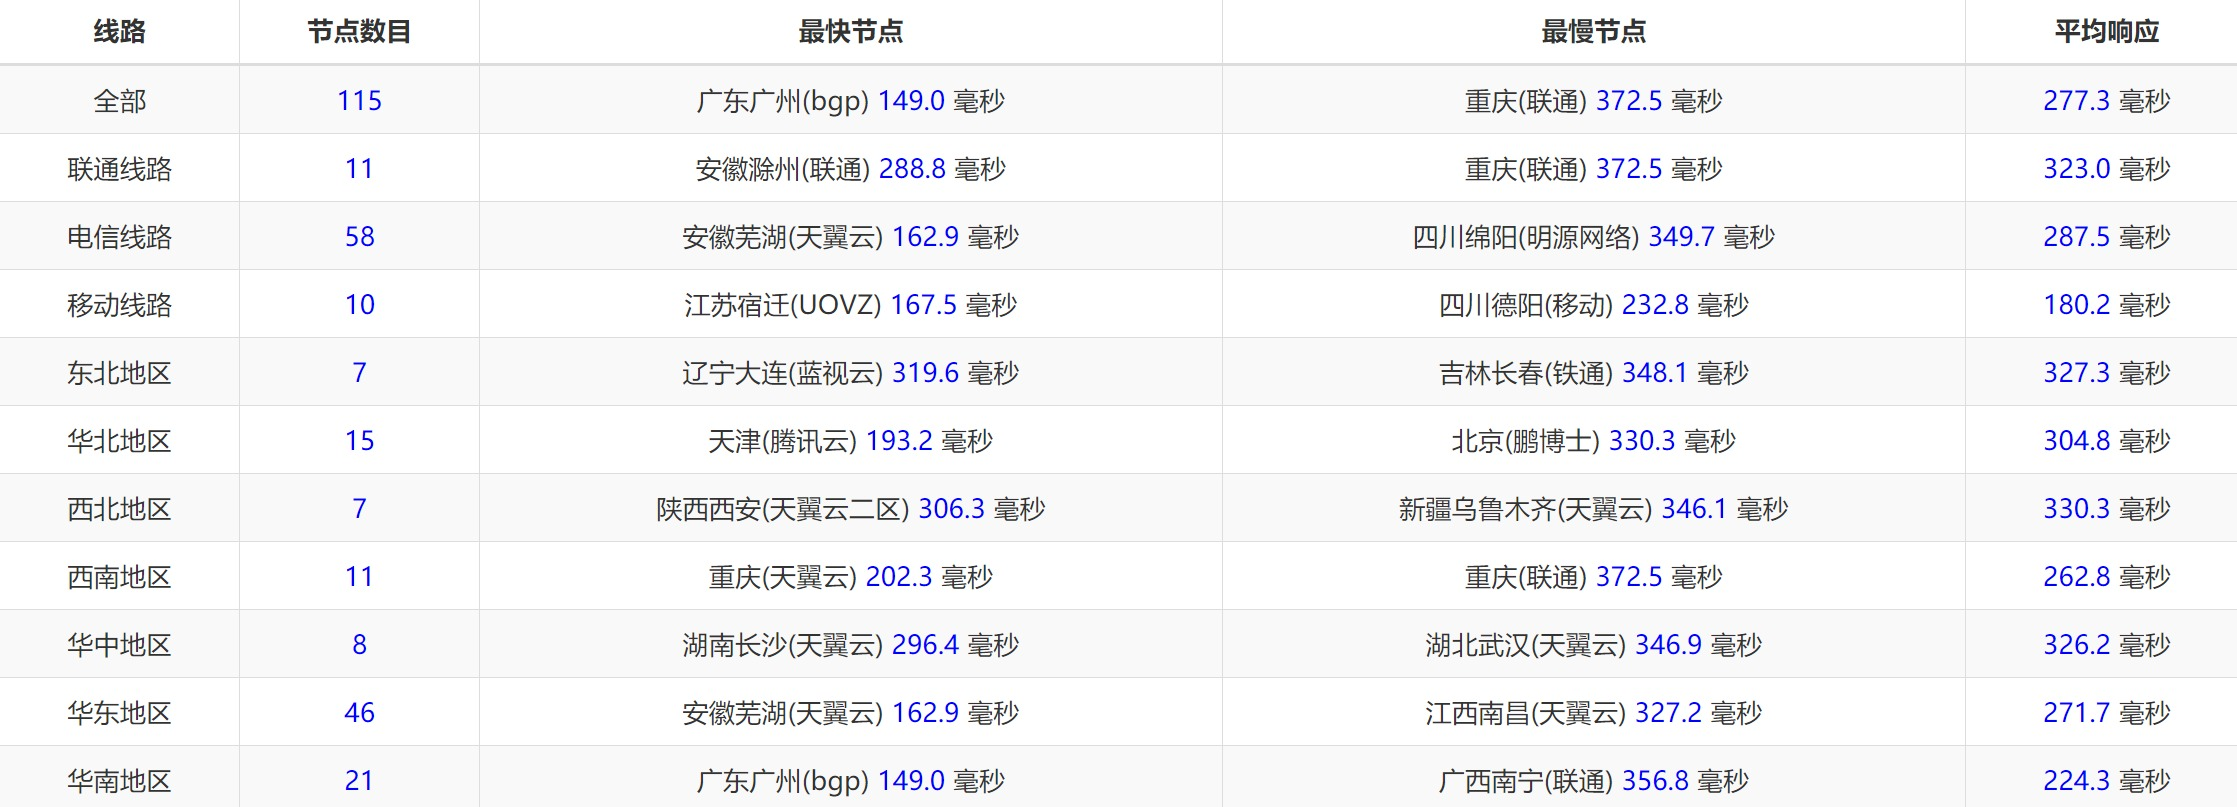 MoeCloud 洛杉矶 KVM 测评 / ¥35.75 月付 / CN2 GIA / AMD CPU / 1C 512M / 5G 100 Mbps 1T 流量 / 原生 IP